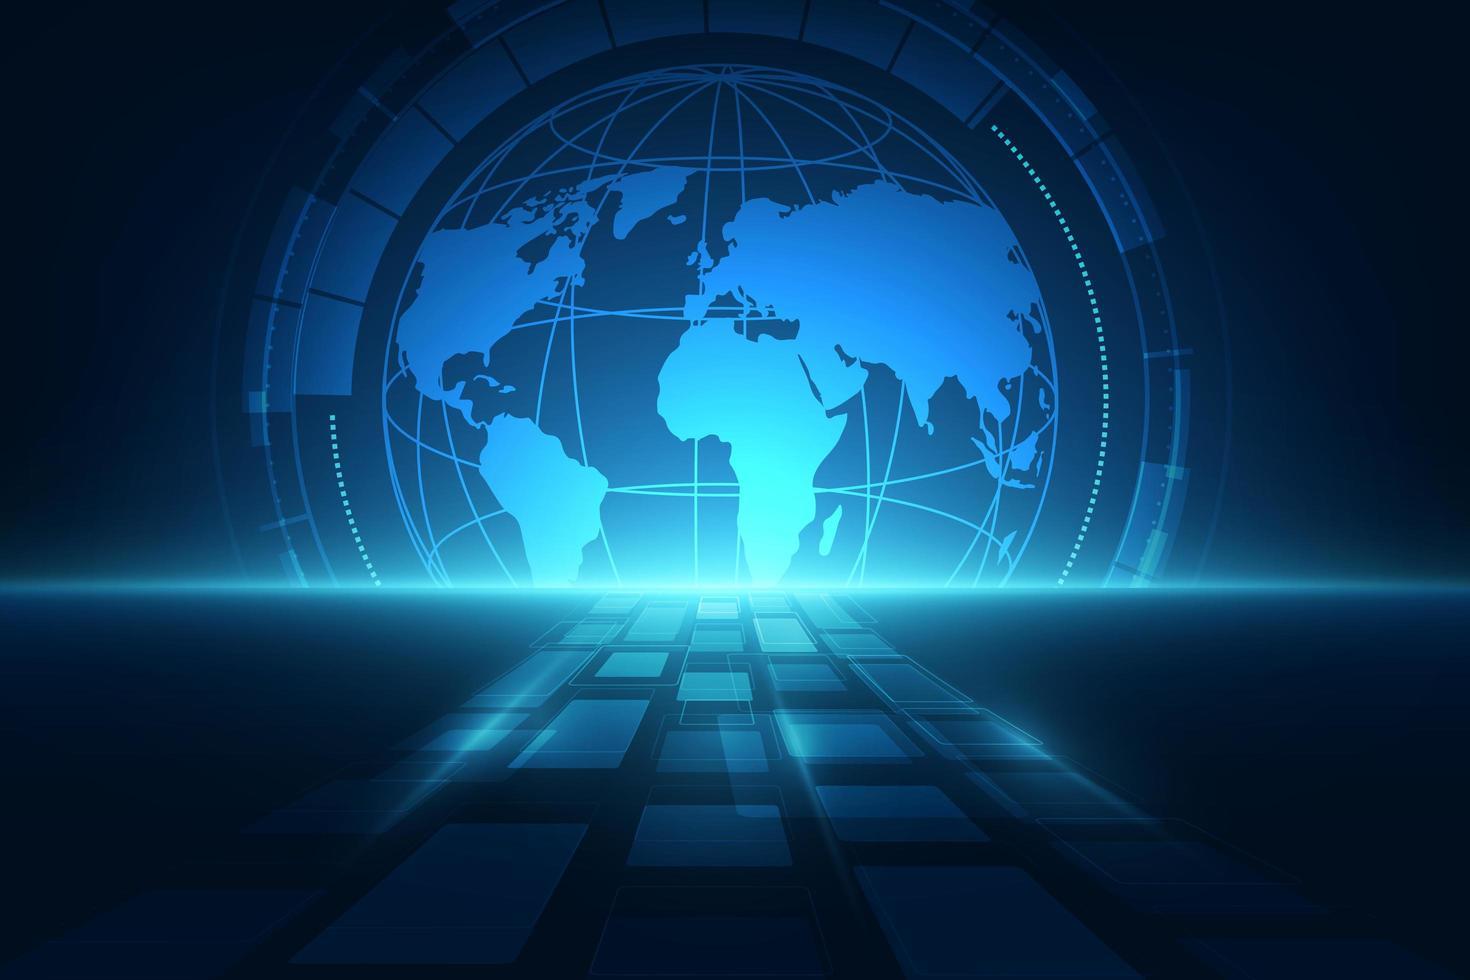 digitalt globalt teknologikoncept, abstrakt bakgrund vektor